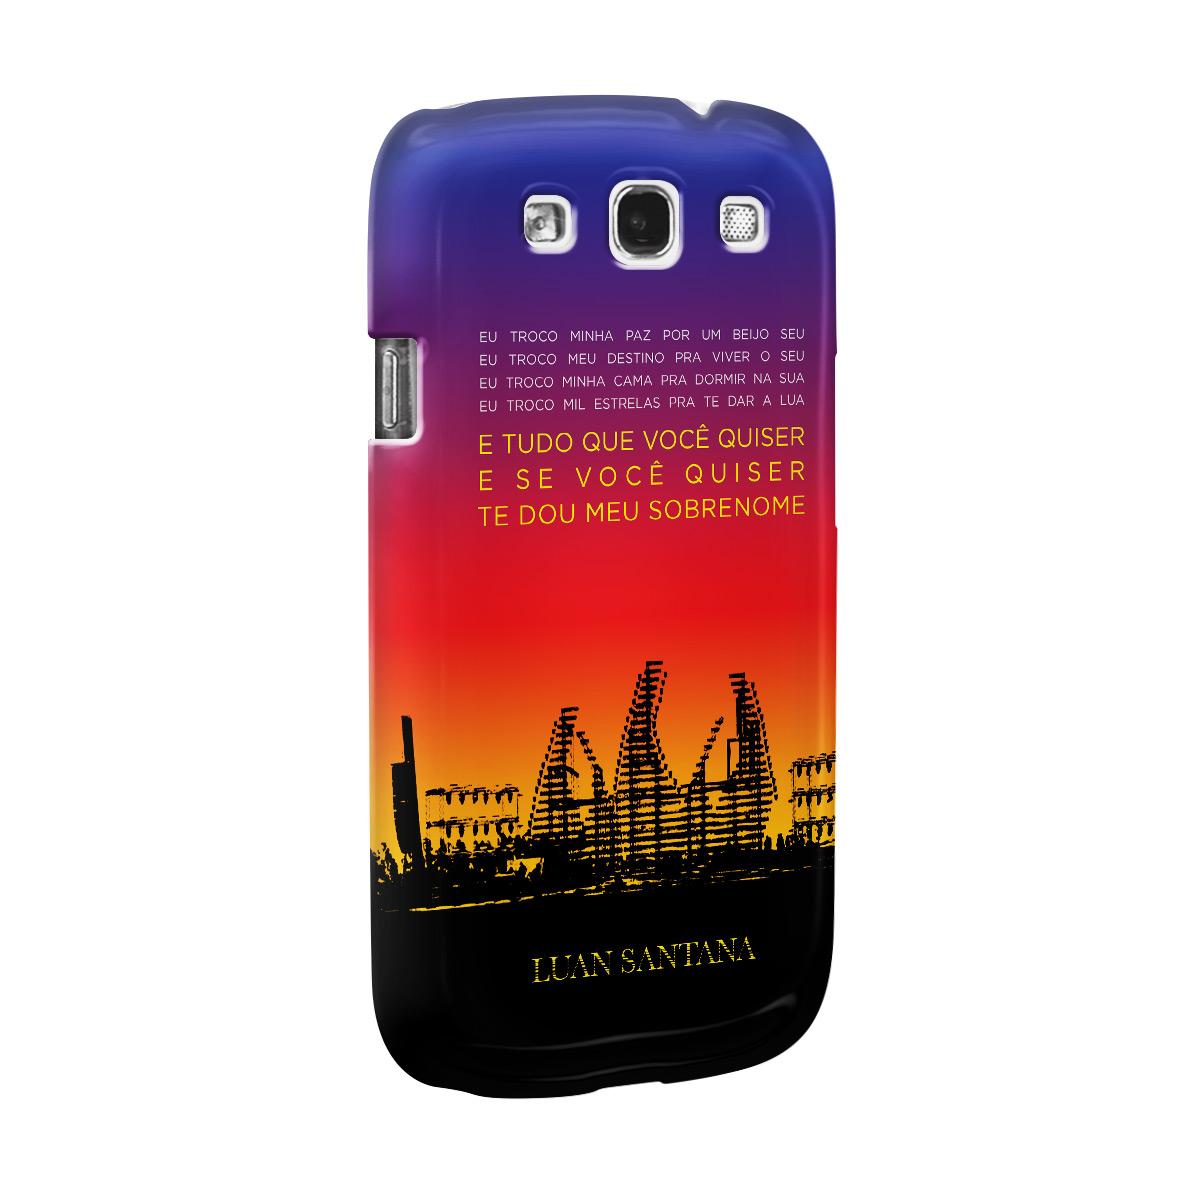 Capa de Celular Samsung S3 Luan Santana Concept